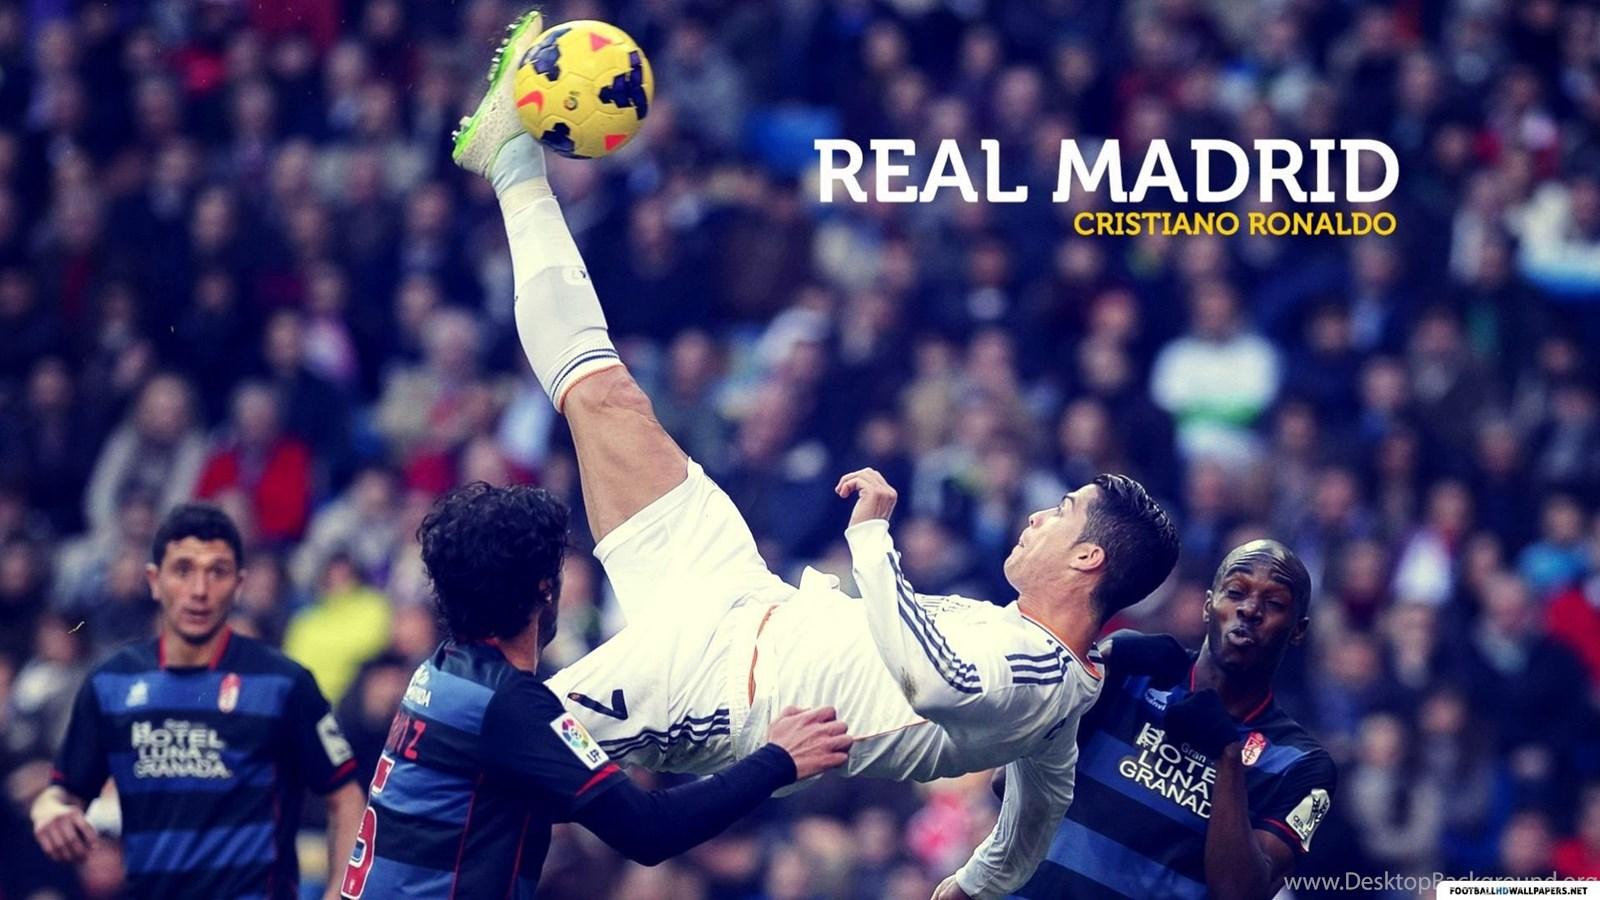 Ultimate Cristiano Ronaldo Real Madrid Hd Football Wallpapers Jpg Desktop Background